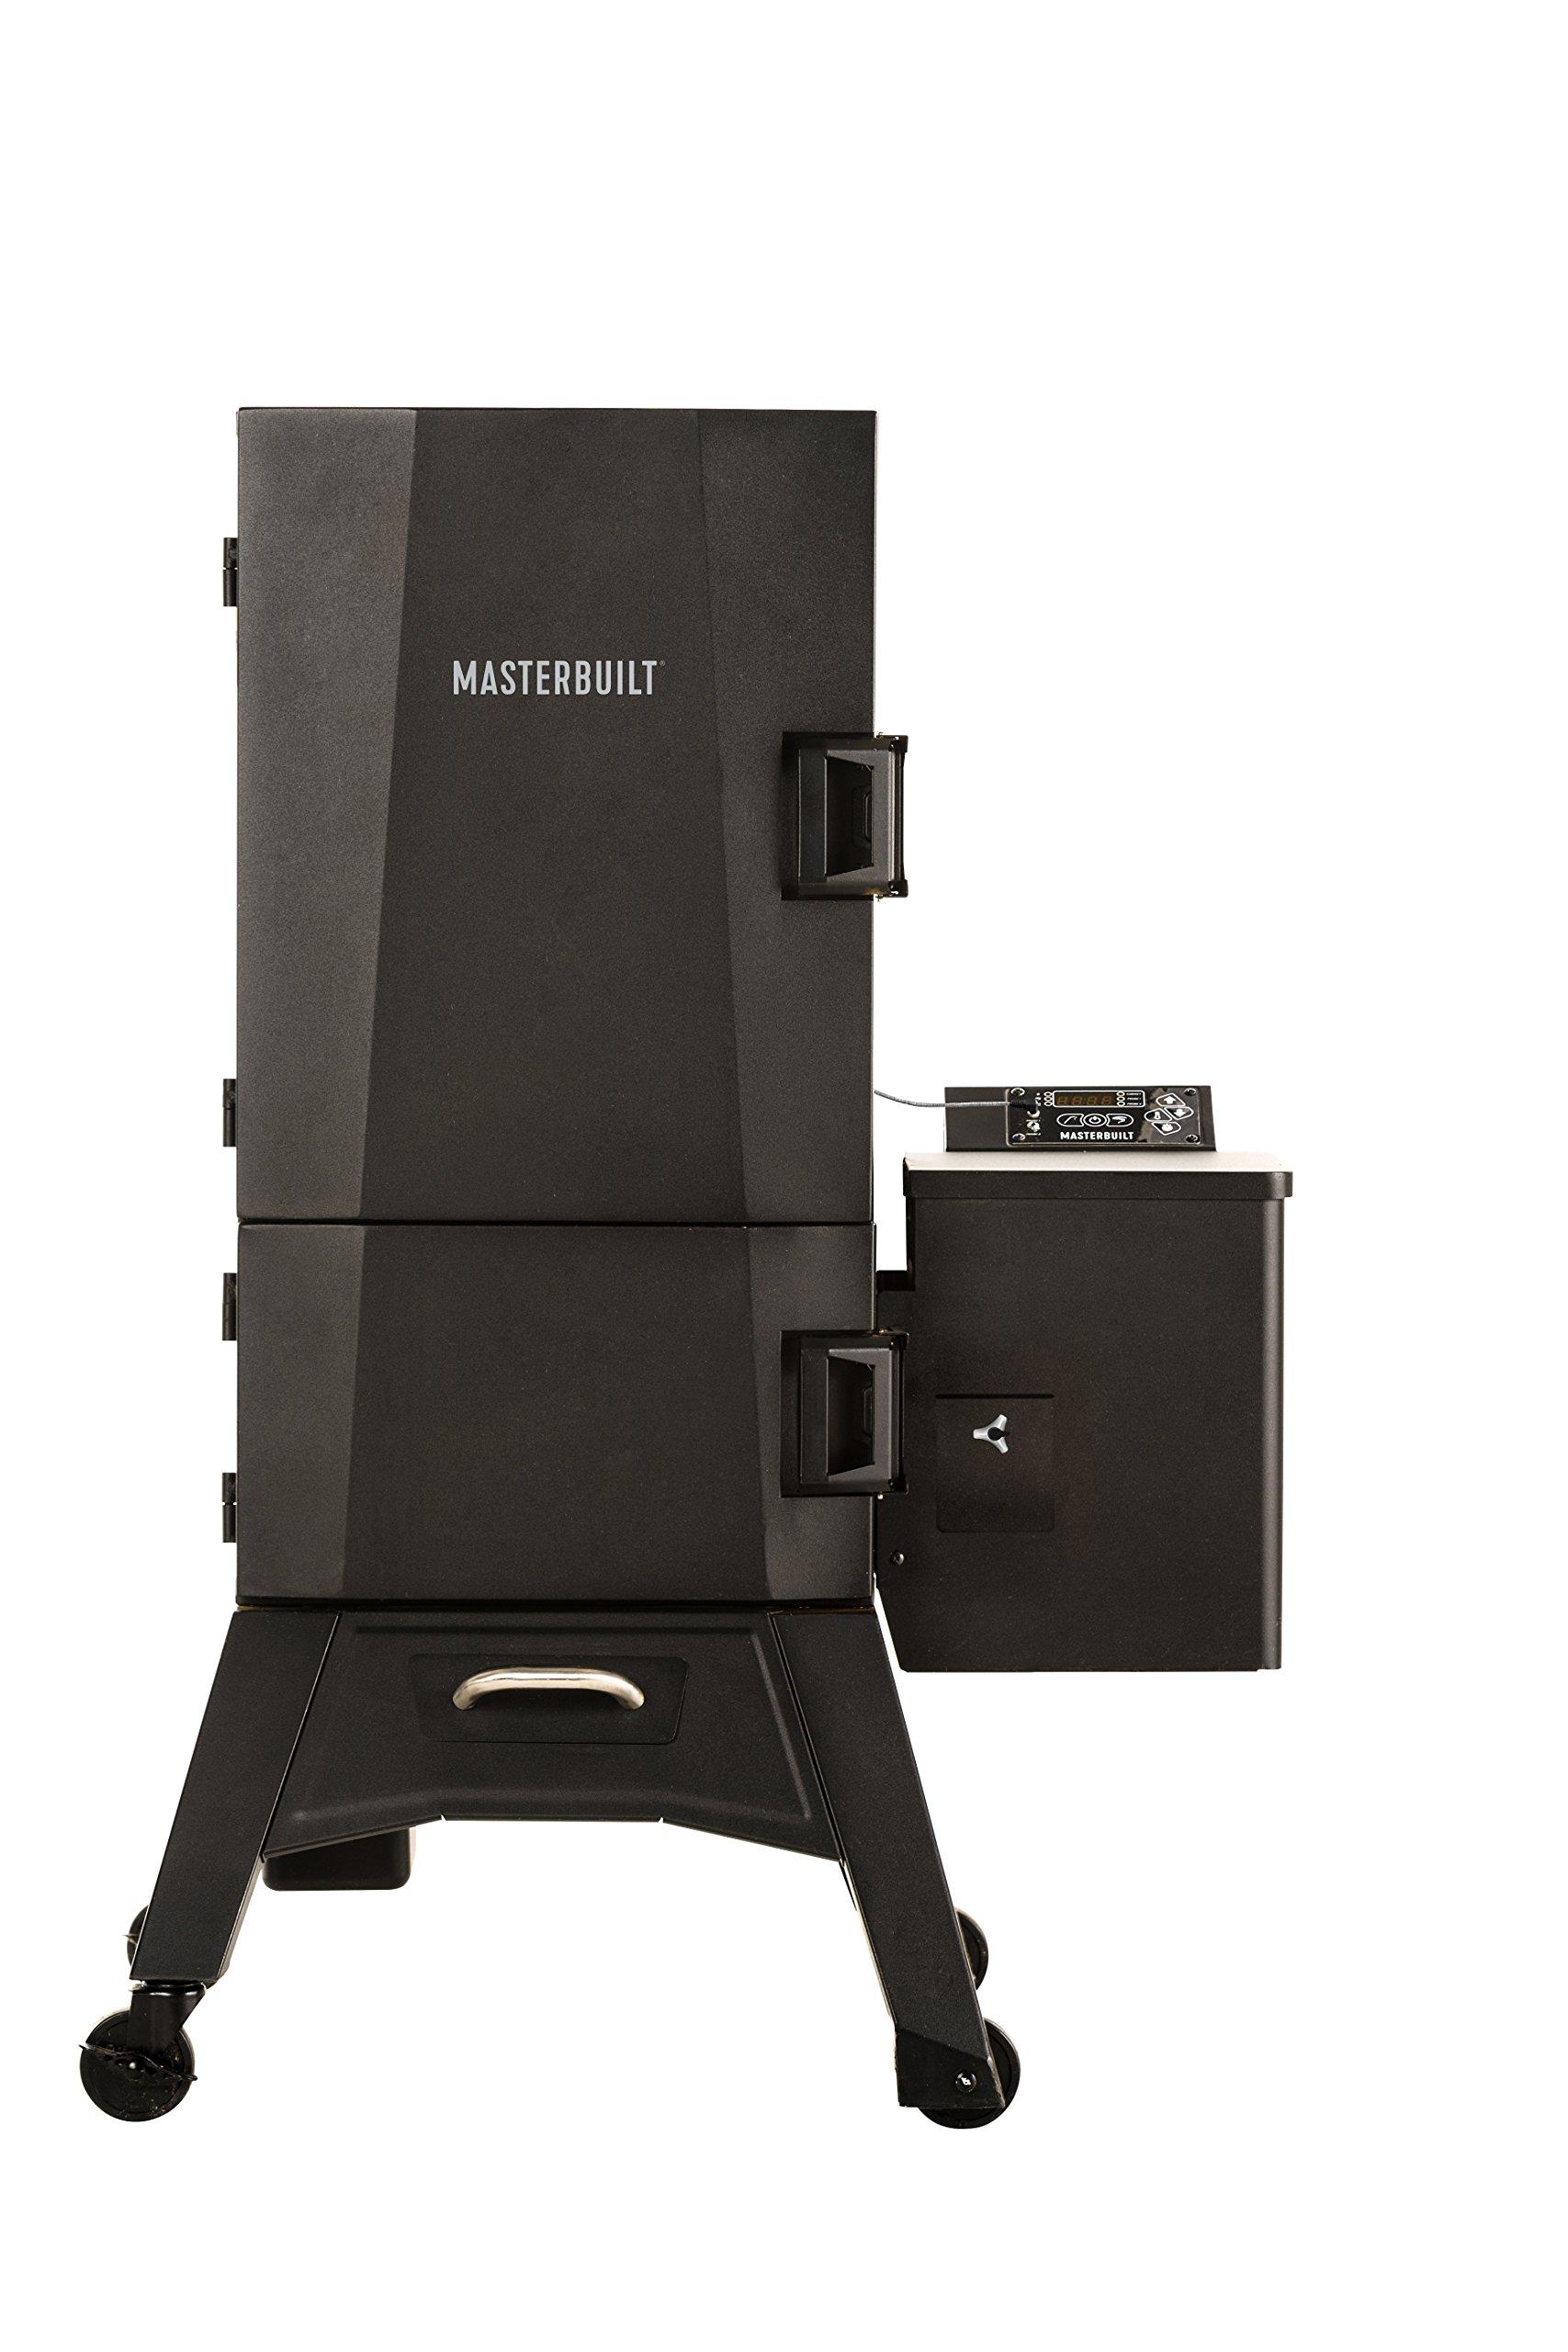 Masterbuilt MB20250618 MWS 330B Pellet Smoker, 30'' Black